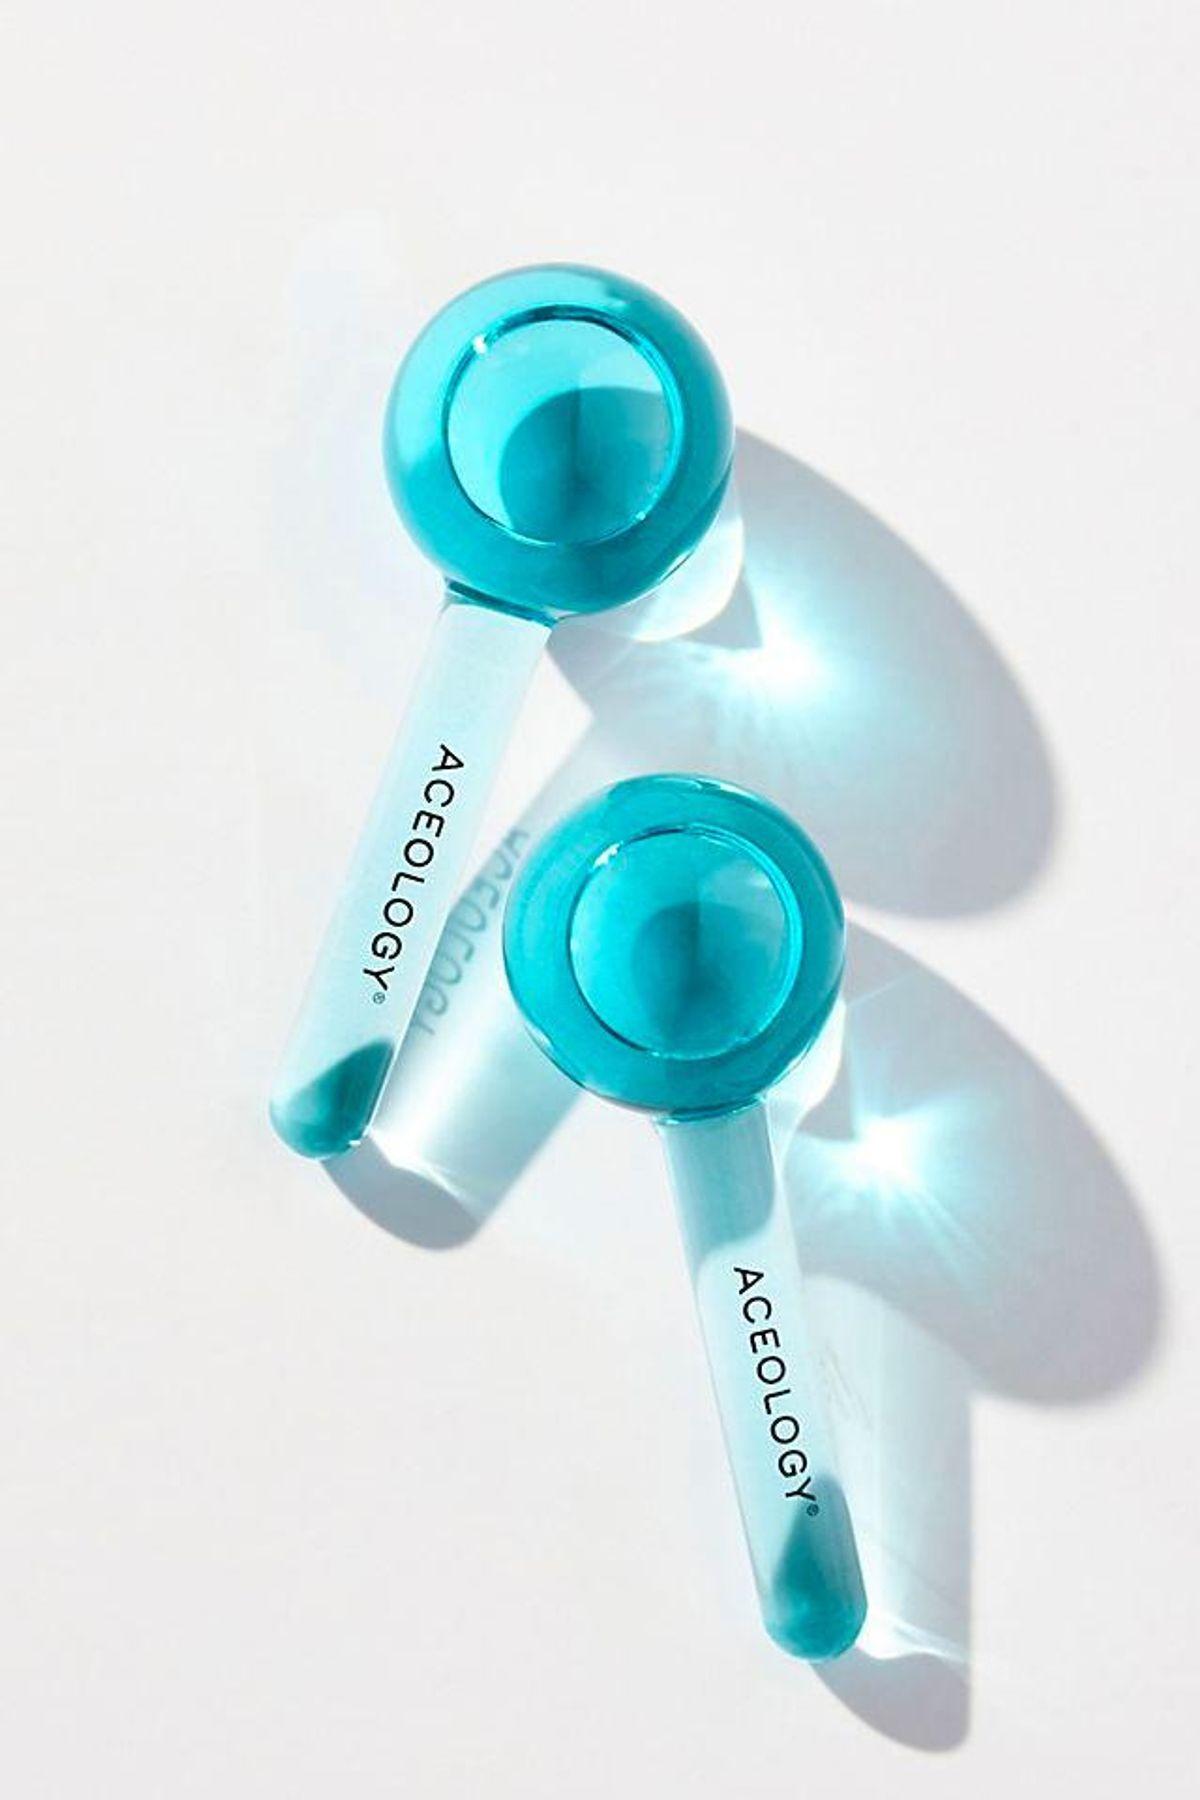 aceology the original blue ice globe facial massage tool set